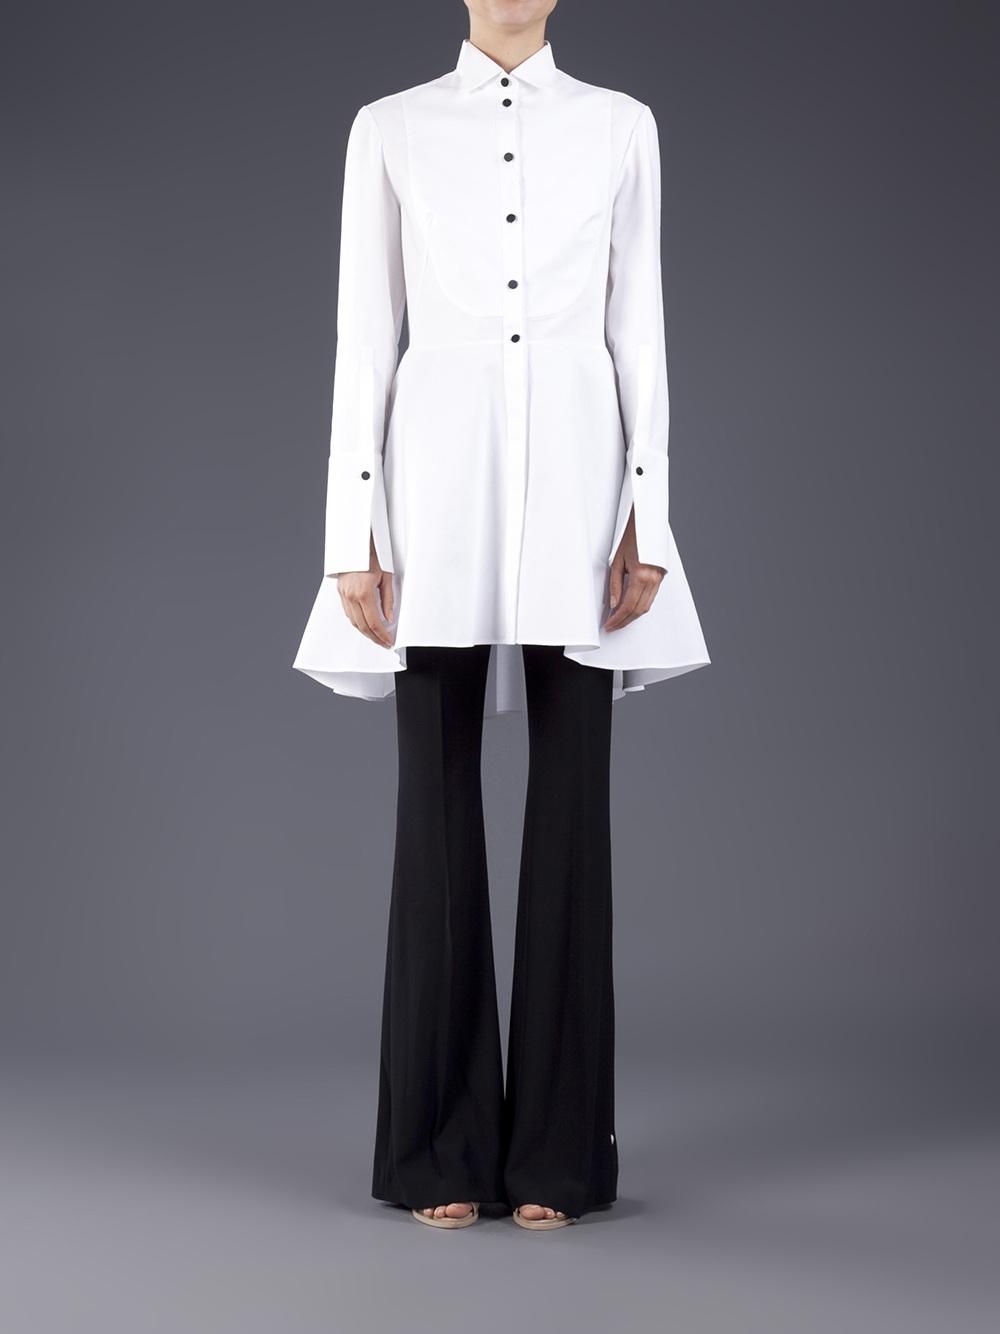 Alexander Mcqueen Tuxedo Shirt Dress In White Lyst